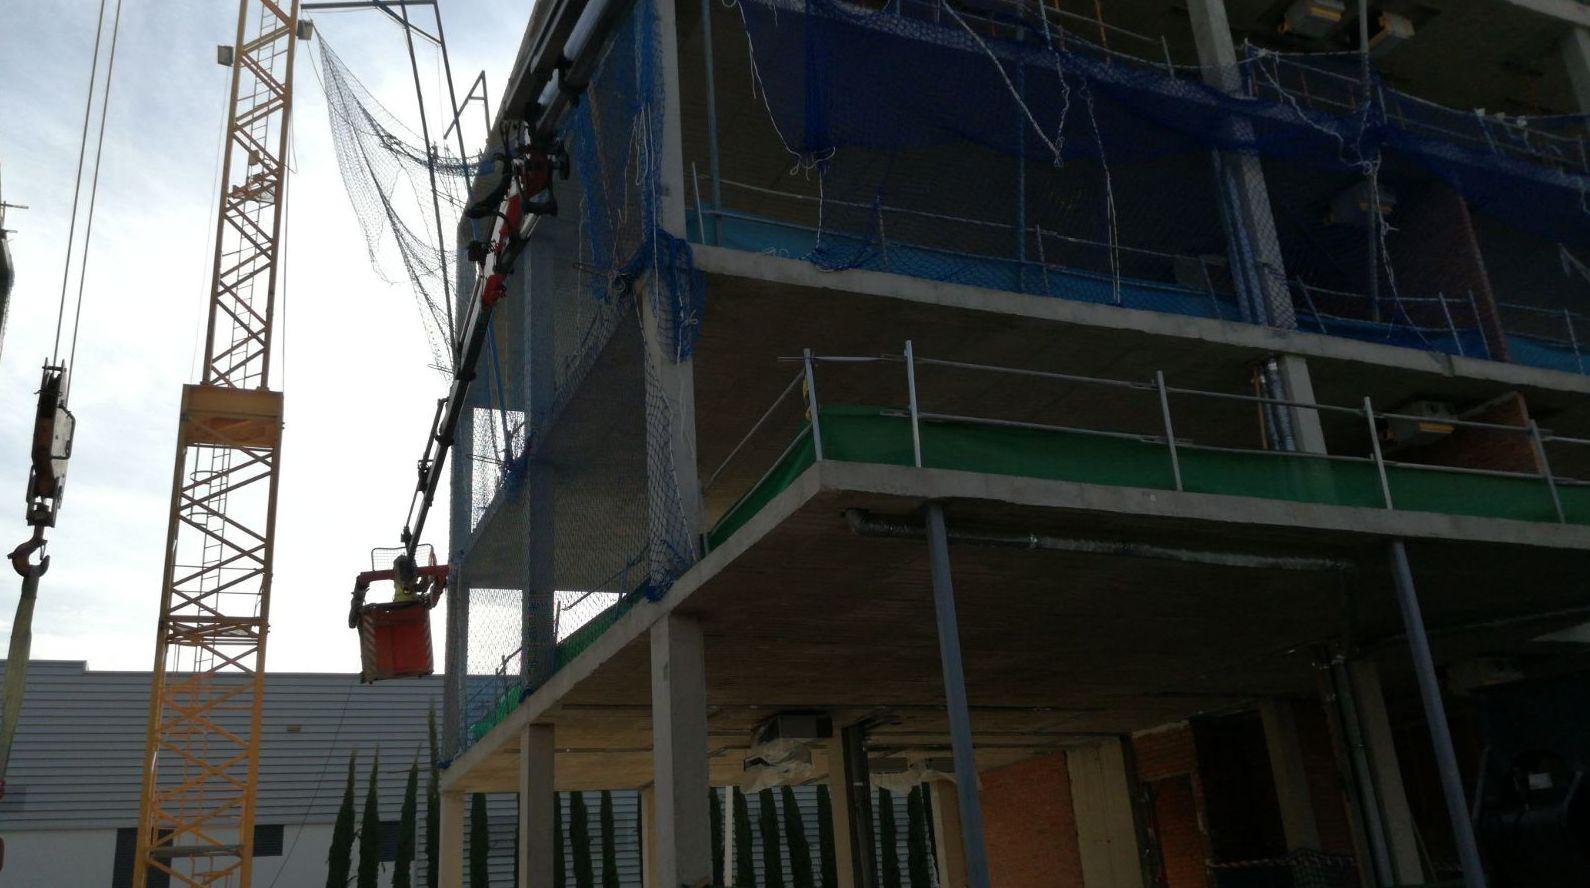 Foto 17 de Efectivos servicios de alquiler de grúas para obras en Torrejón de la Calzada | Grúas Ricar